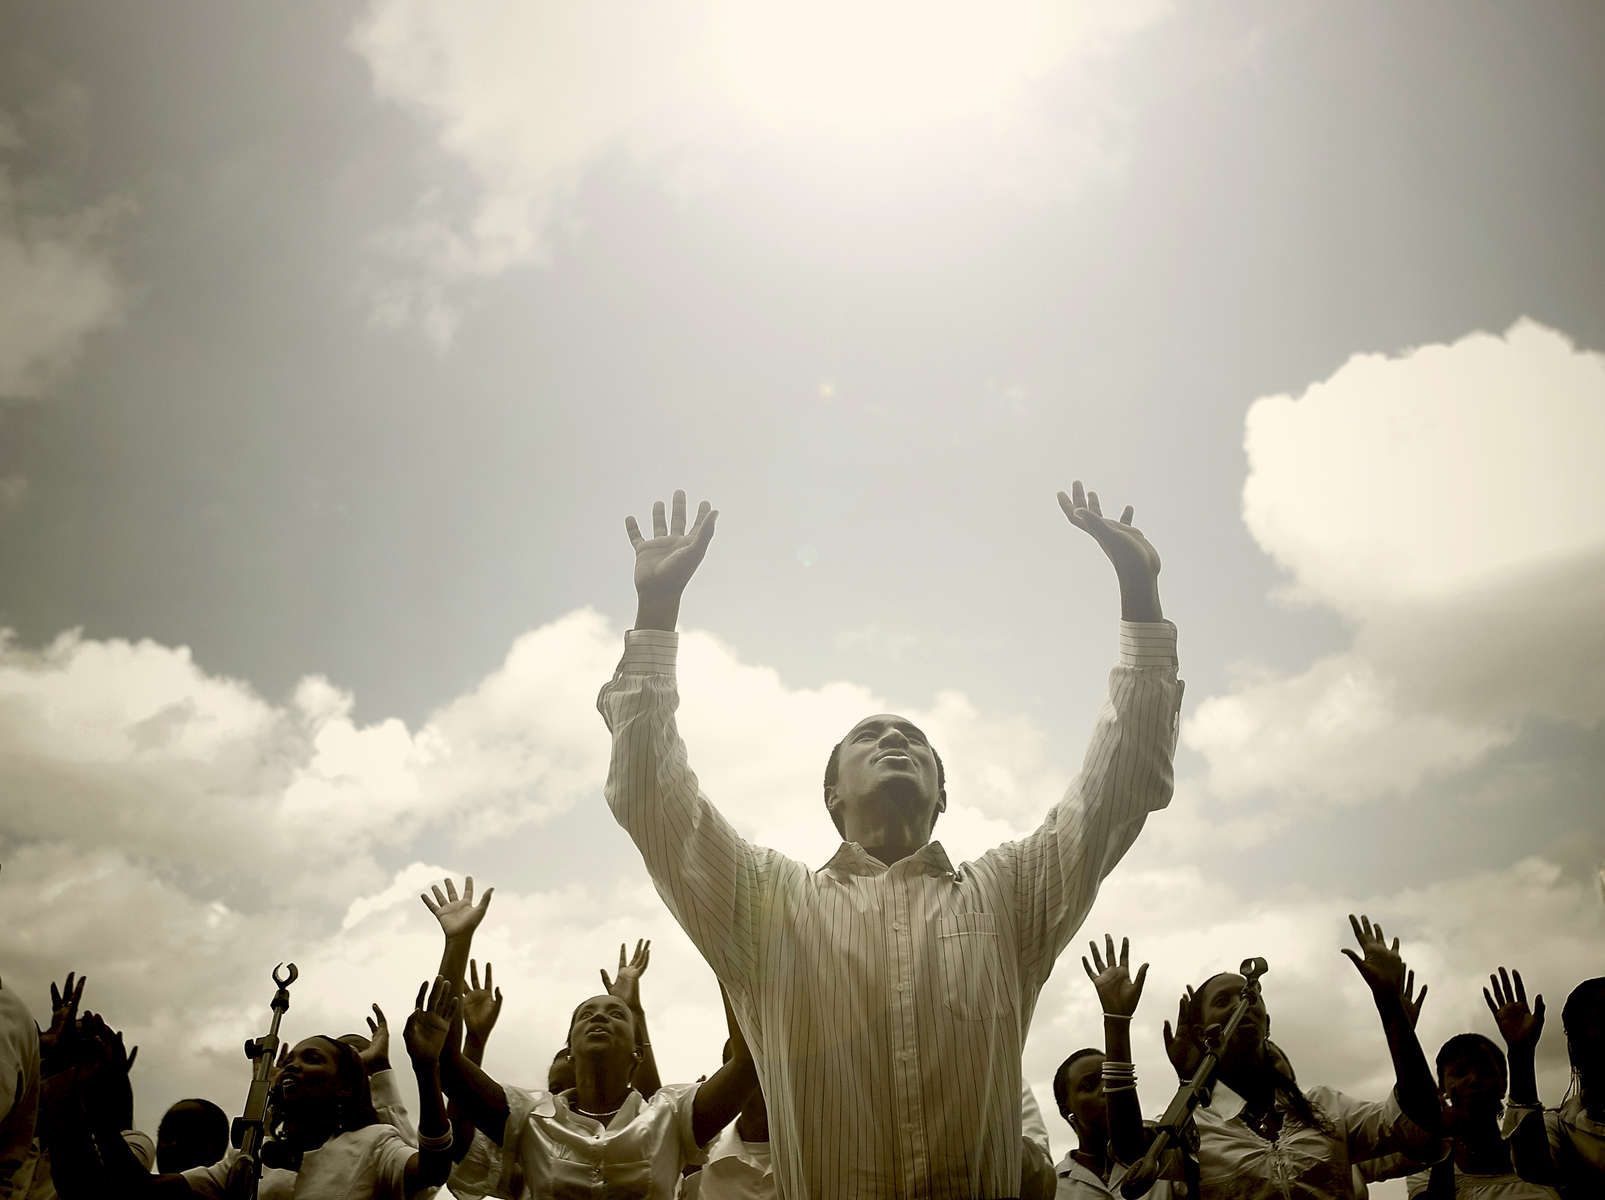 Chicago Photographer Alex GarciaSaddleback Church PEACE plan.